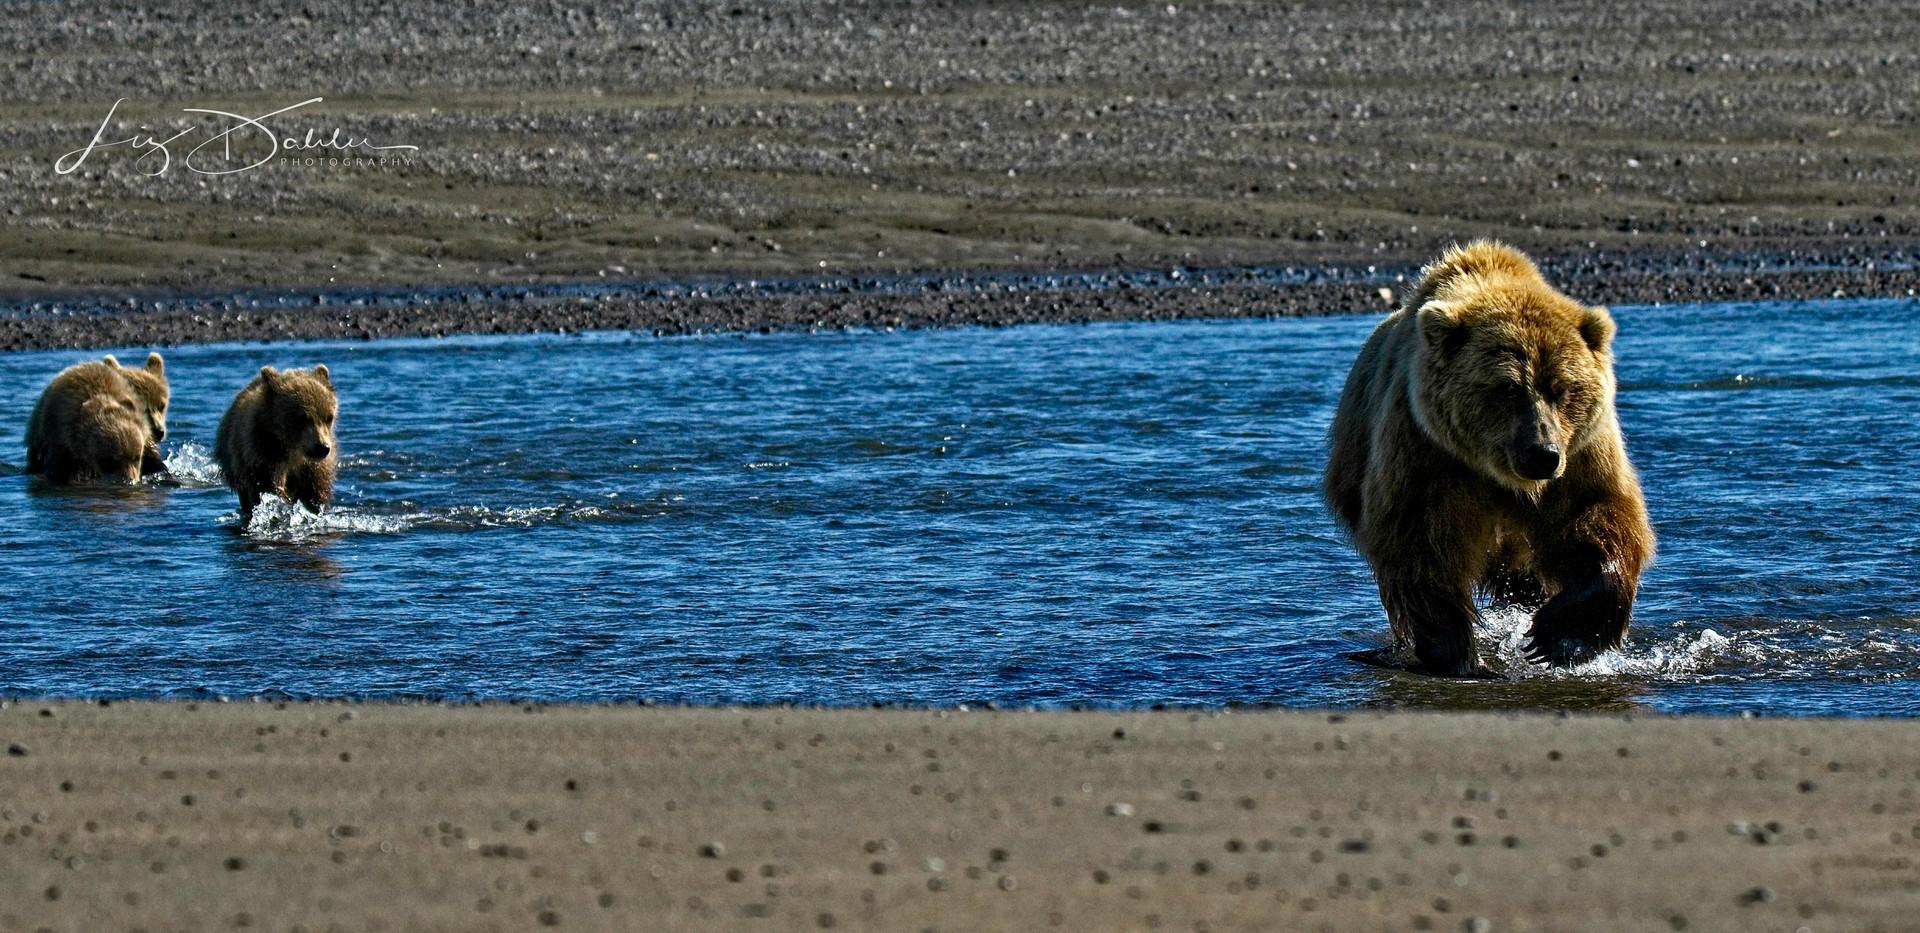 Crossing Blue Water